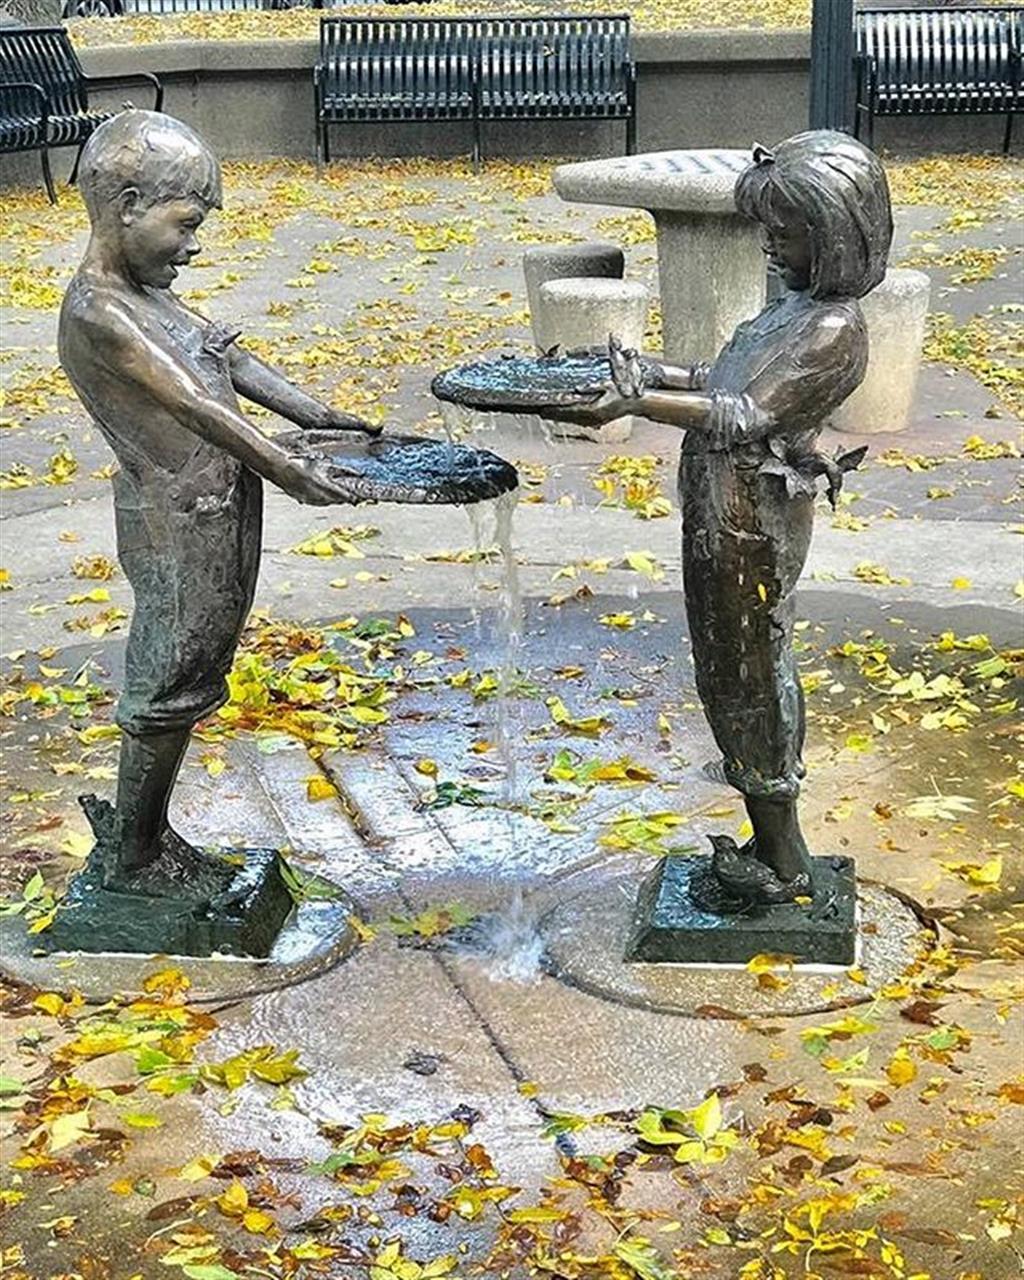 Chicago statues #chicago #leadingrelocal #bairdwarner #publicArt #fall